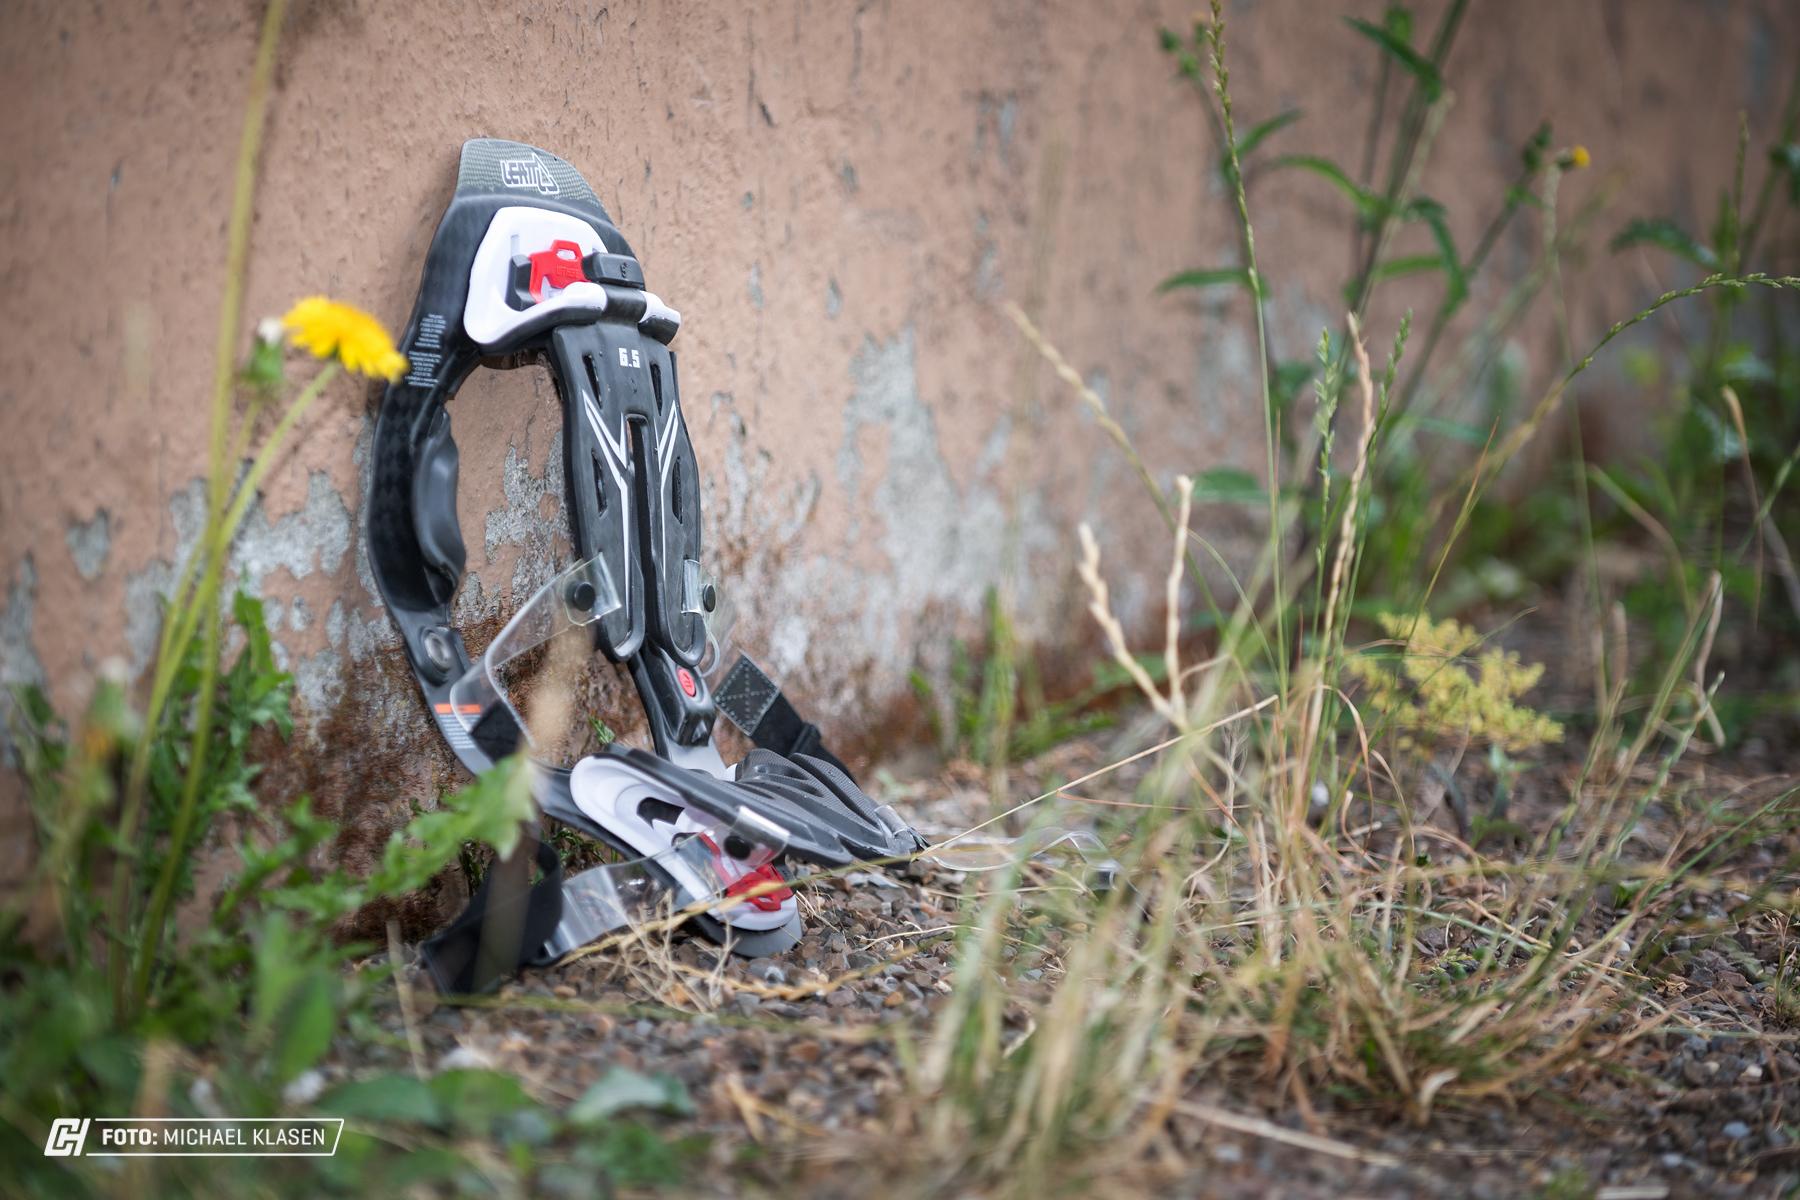 MIK 0262 Cycleholix